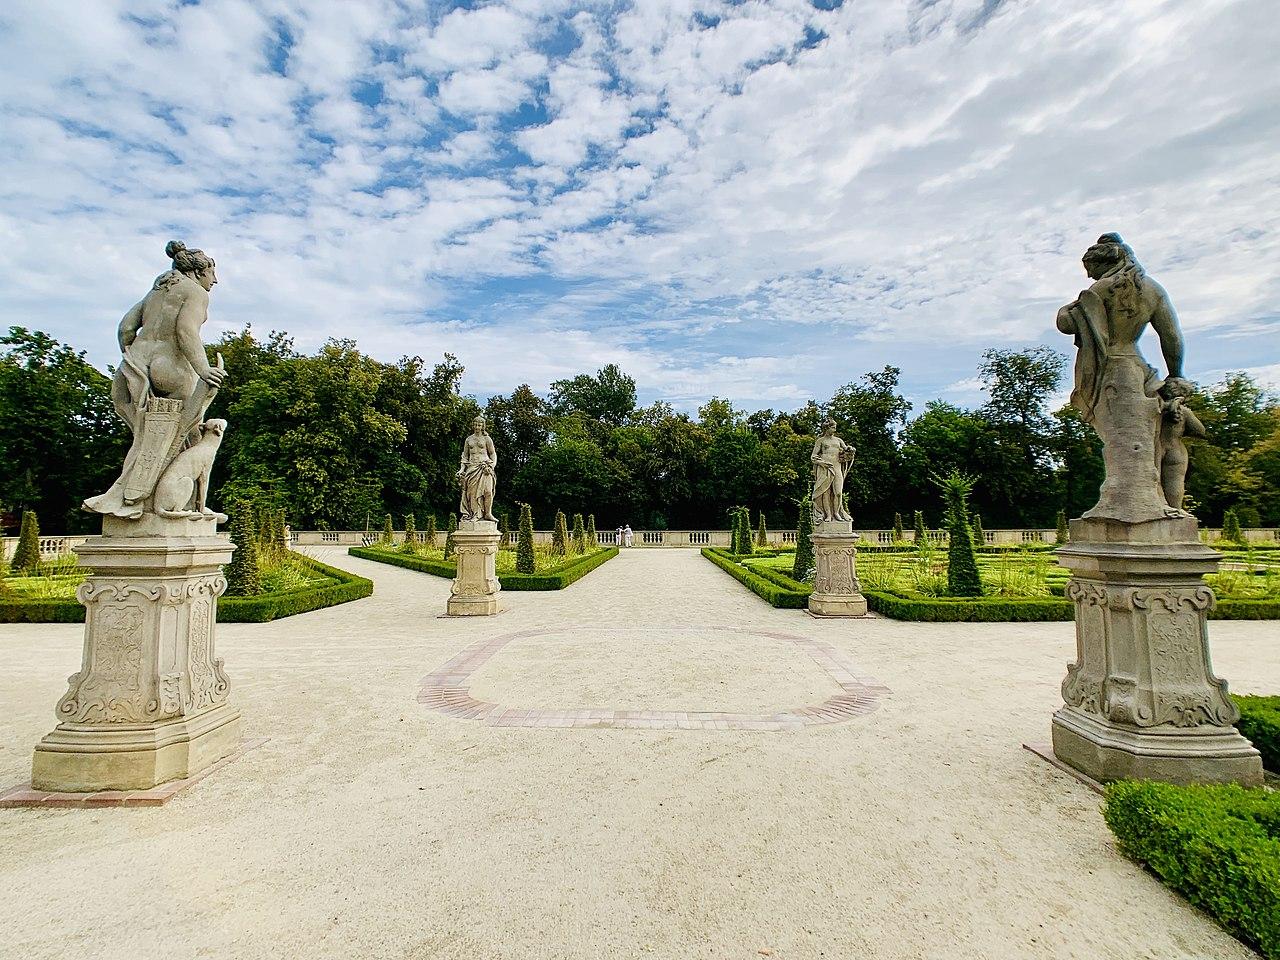 Garden sculptures of the Wilanów Palace, Poland 04.jpg